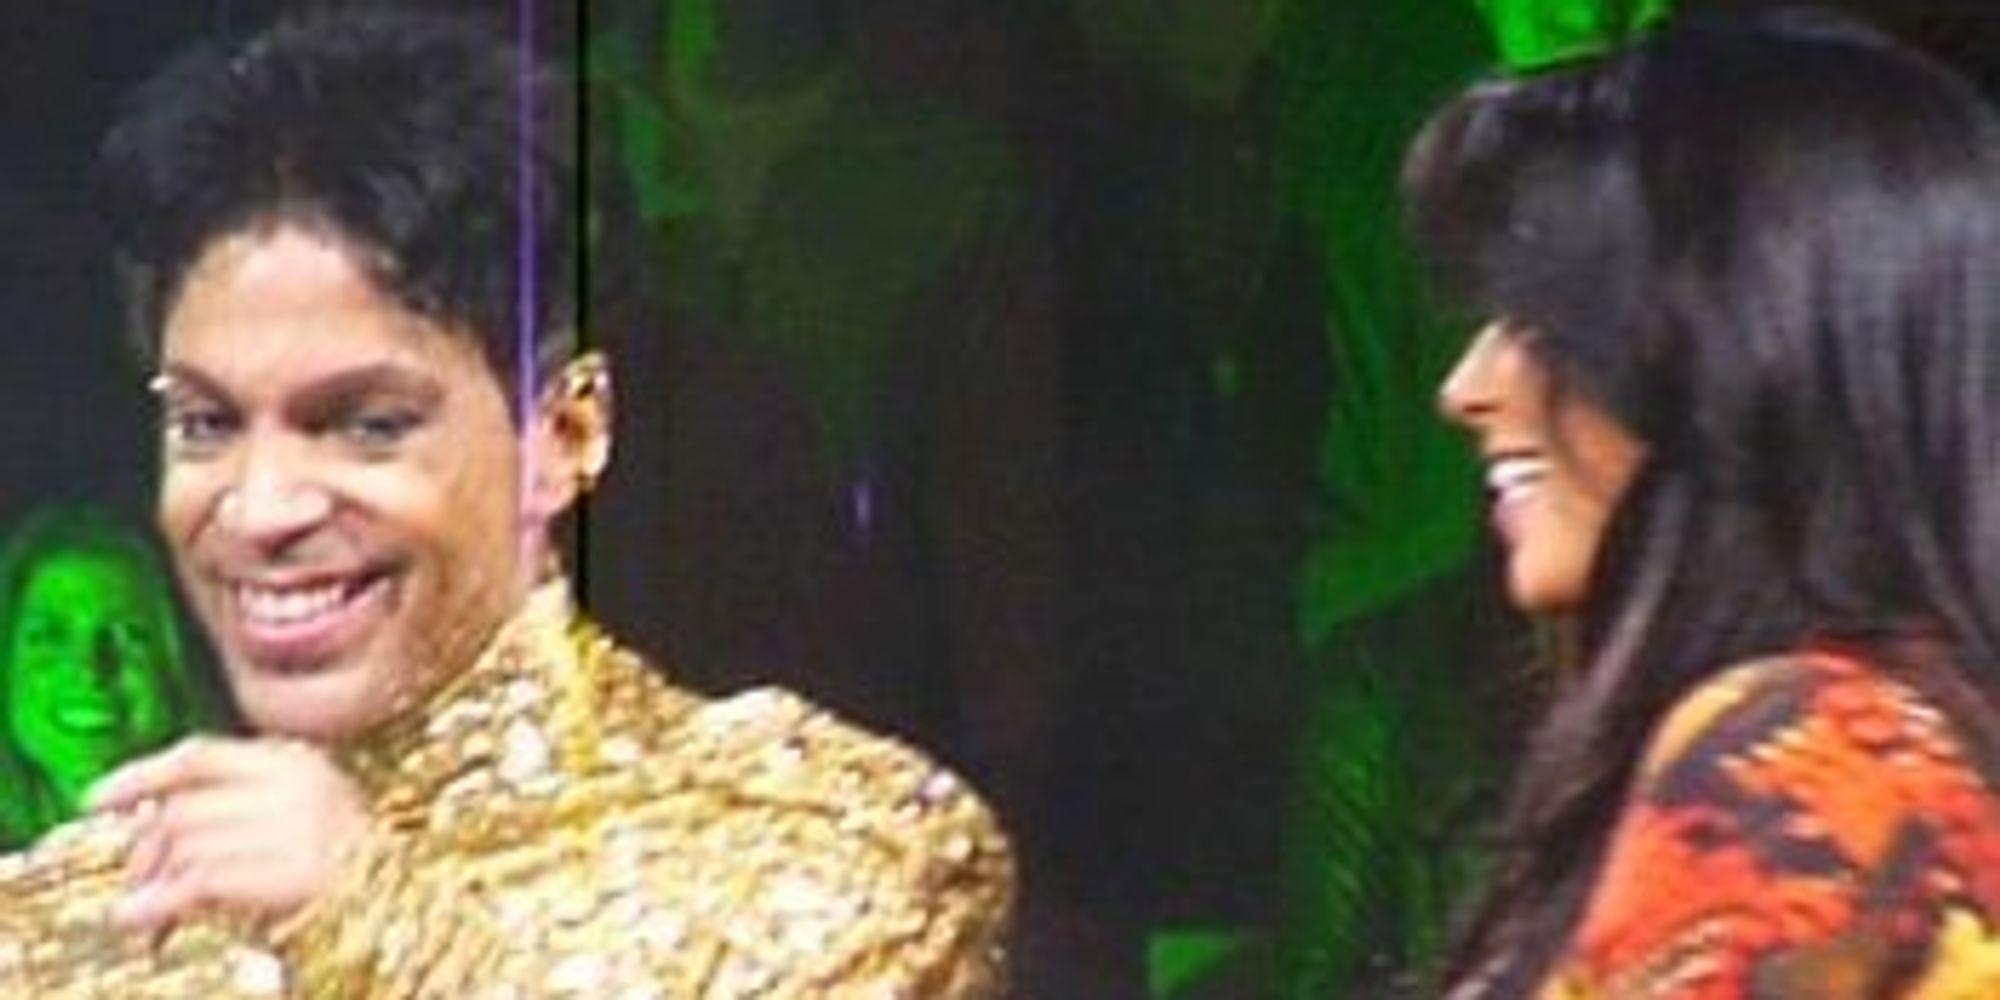 Remember That Time Prince Kicked Kim Kardashian Off The Stage?